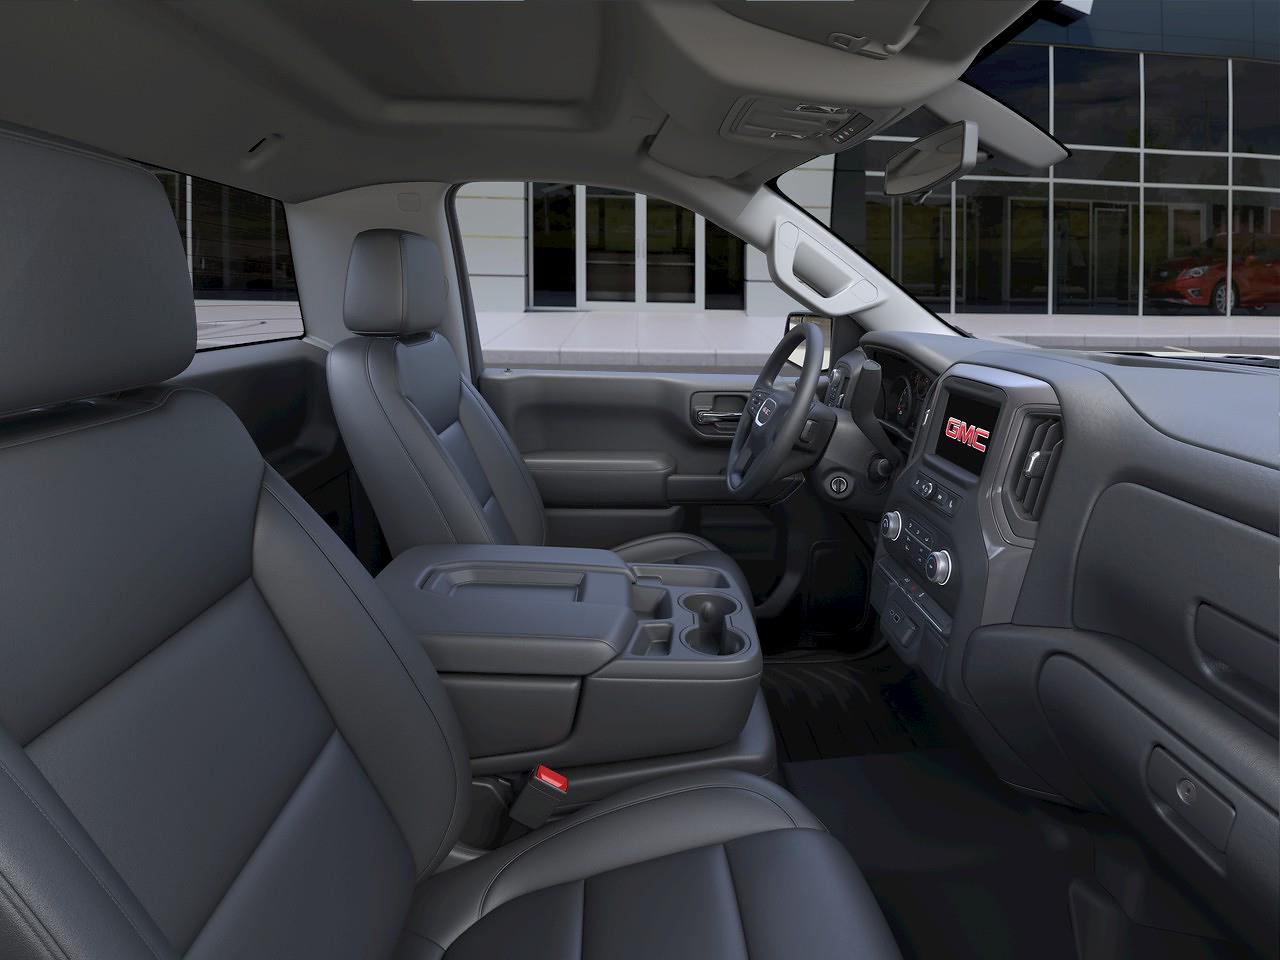 2021 GMC Sierra 1500 Regular Cab 4x4, Pickup #389460 - photo 14